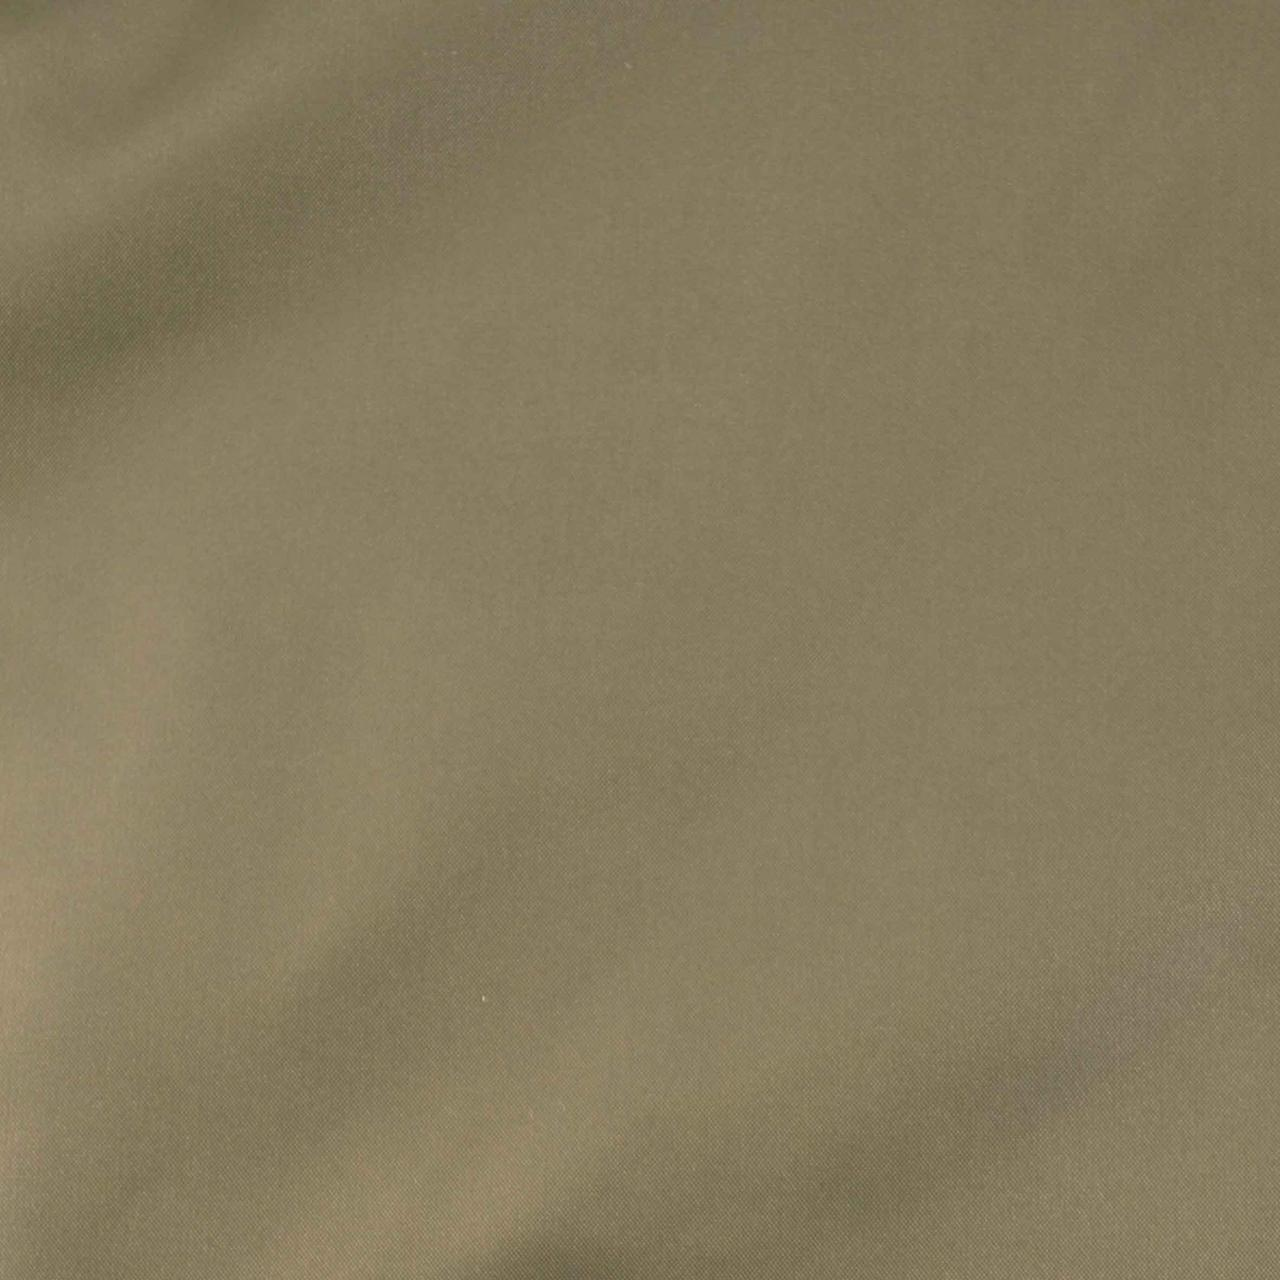 Ткань плащевка AА1 2020 10